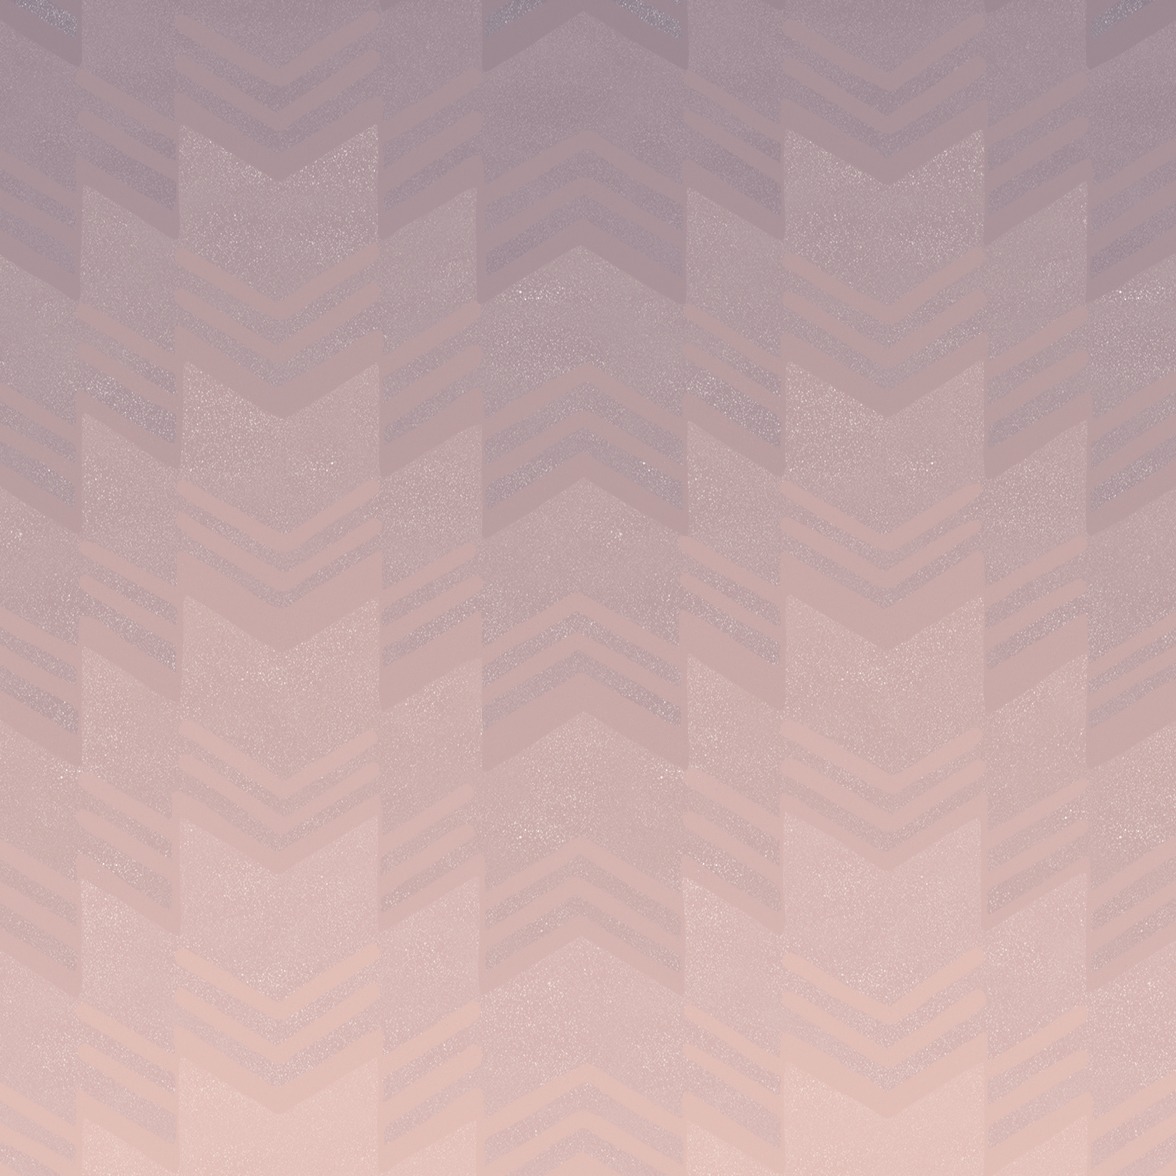 Horizon_Colorway5.2_WEB4.jpg